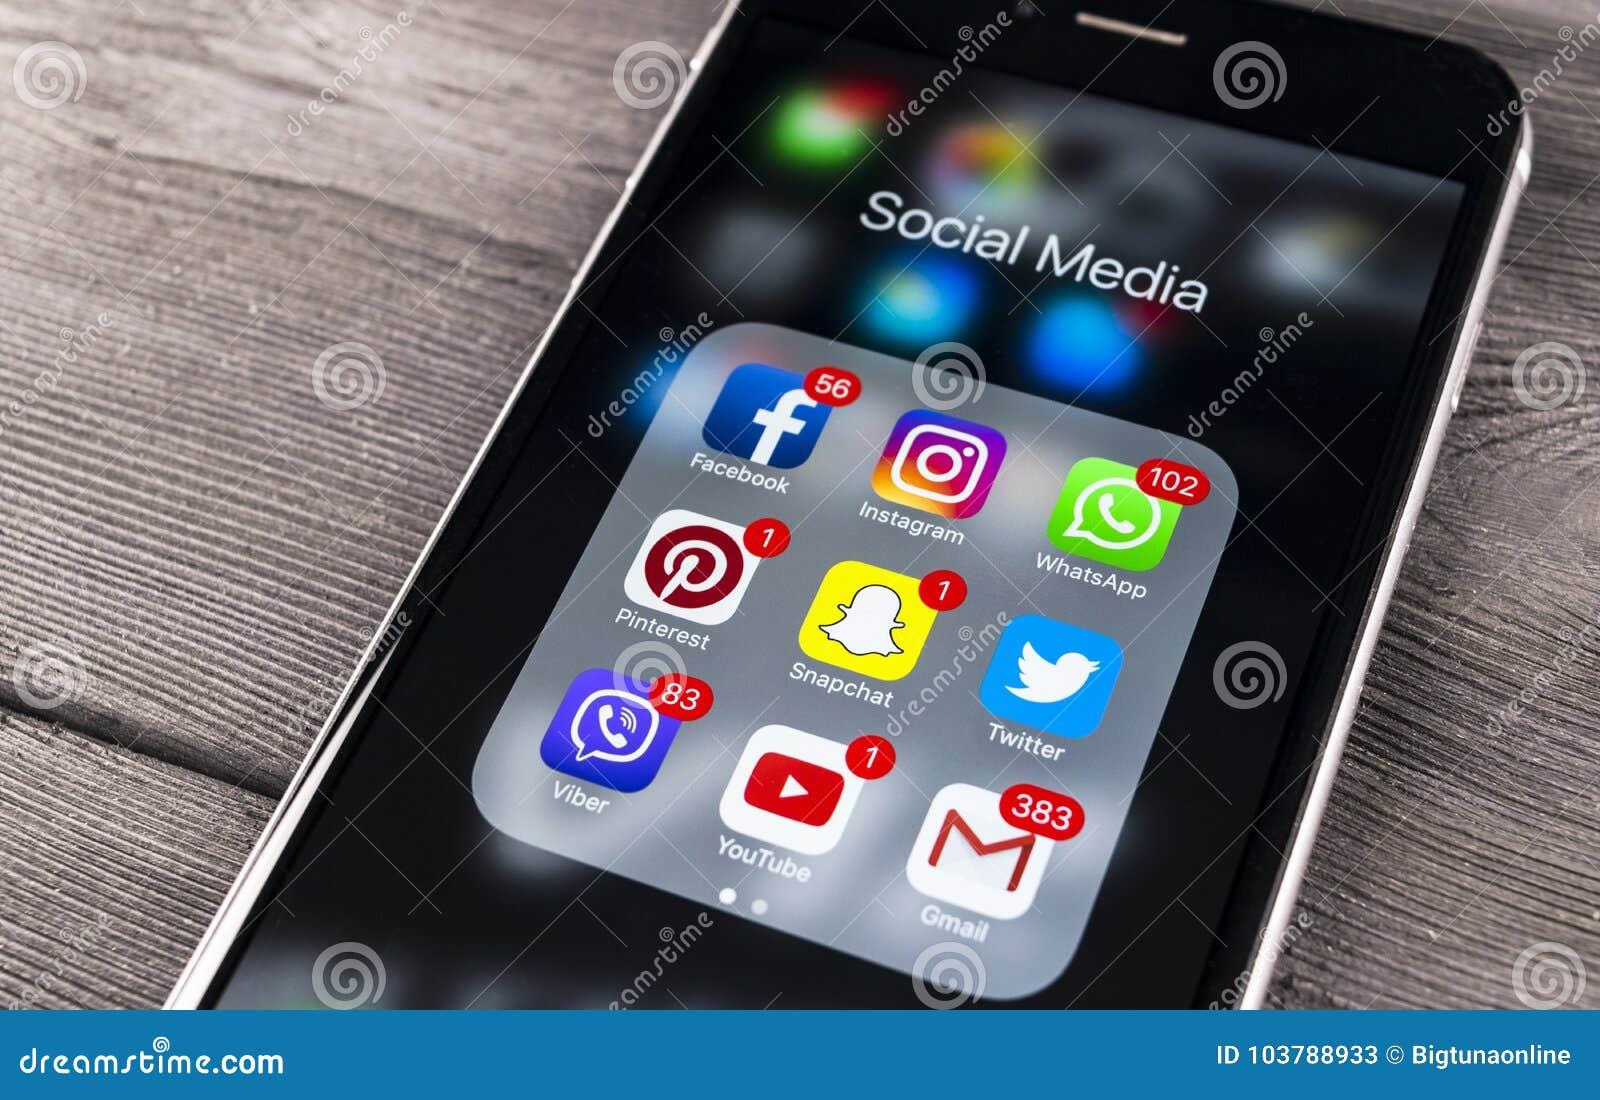 IPhone 7 της Apple στον ξύλινο πίνακα με τα εικονίδια των κοινωνικών μέσων facebook, instagram, πειραχτήρι, snapchat εφαρμογή στη